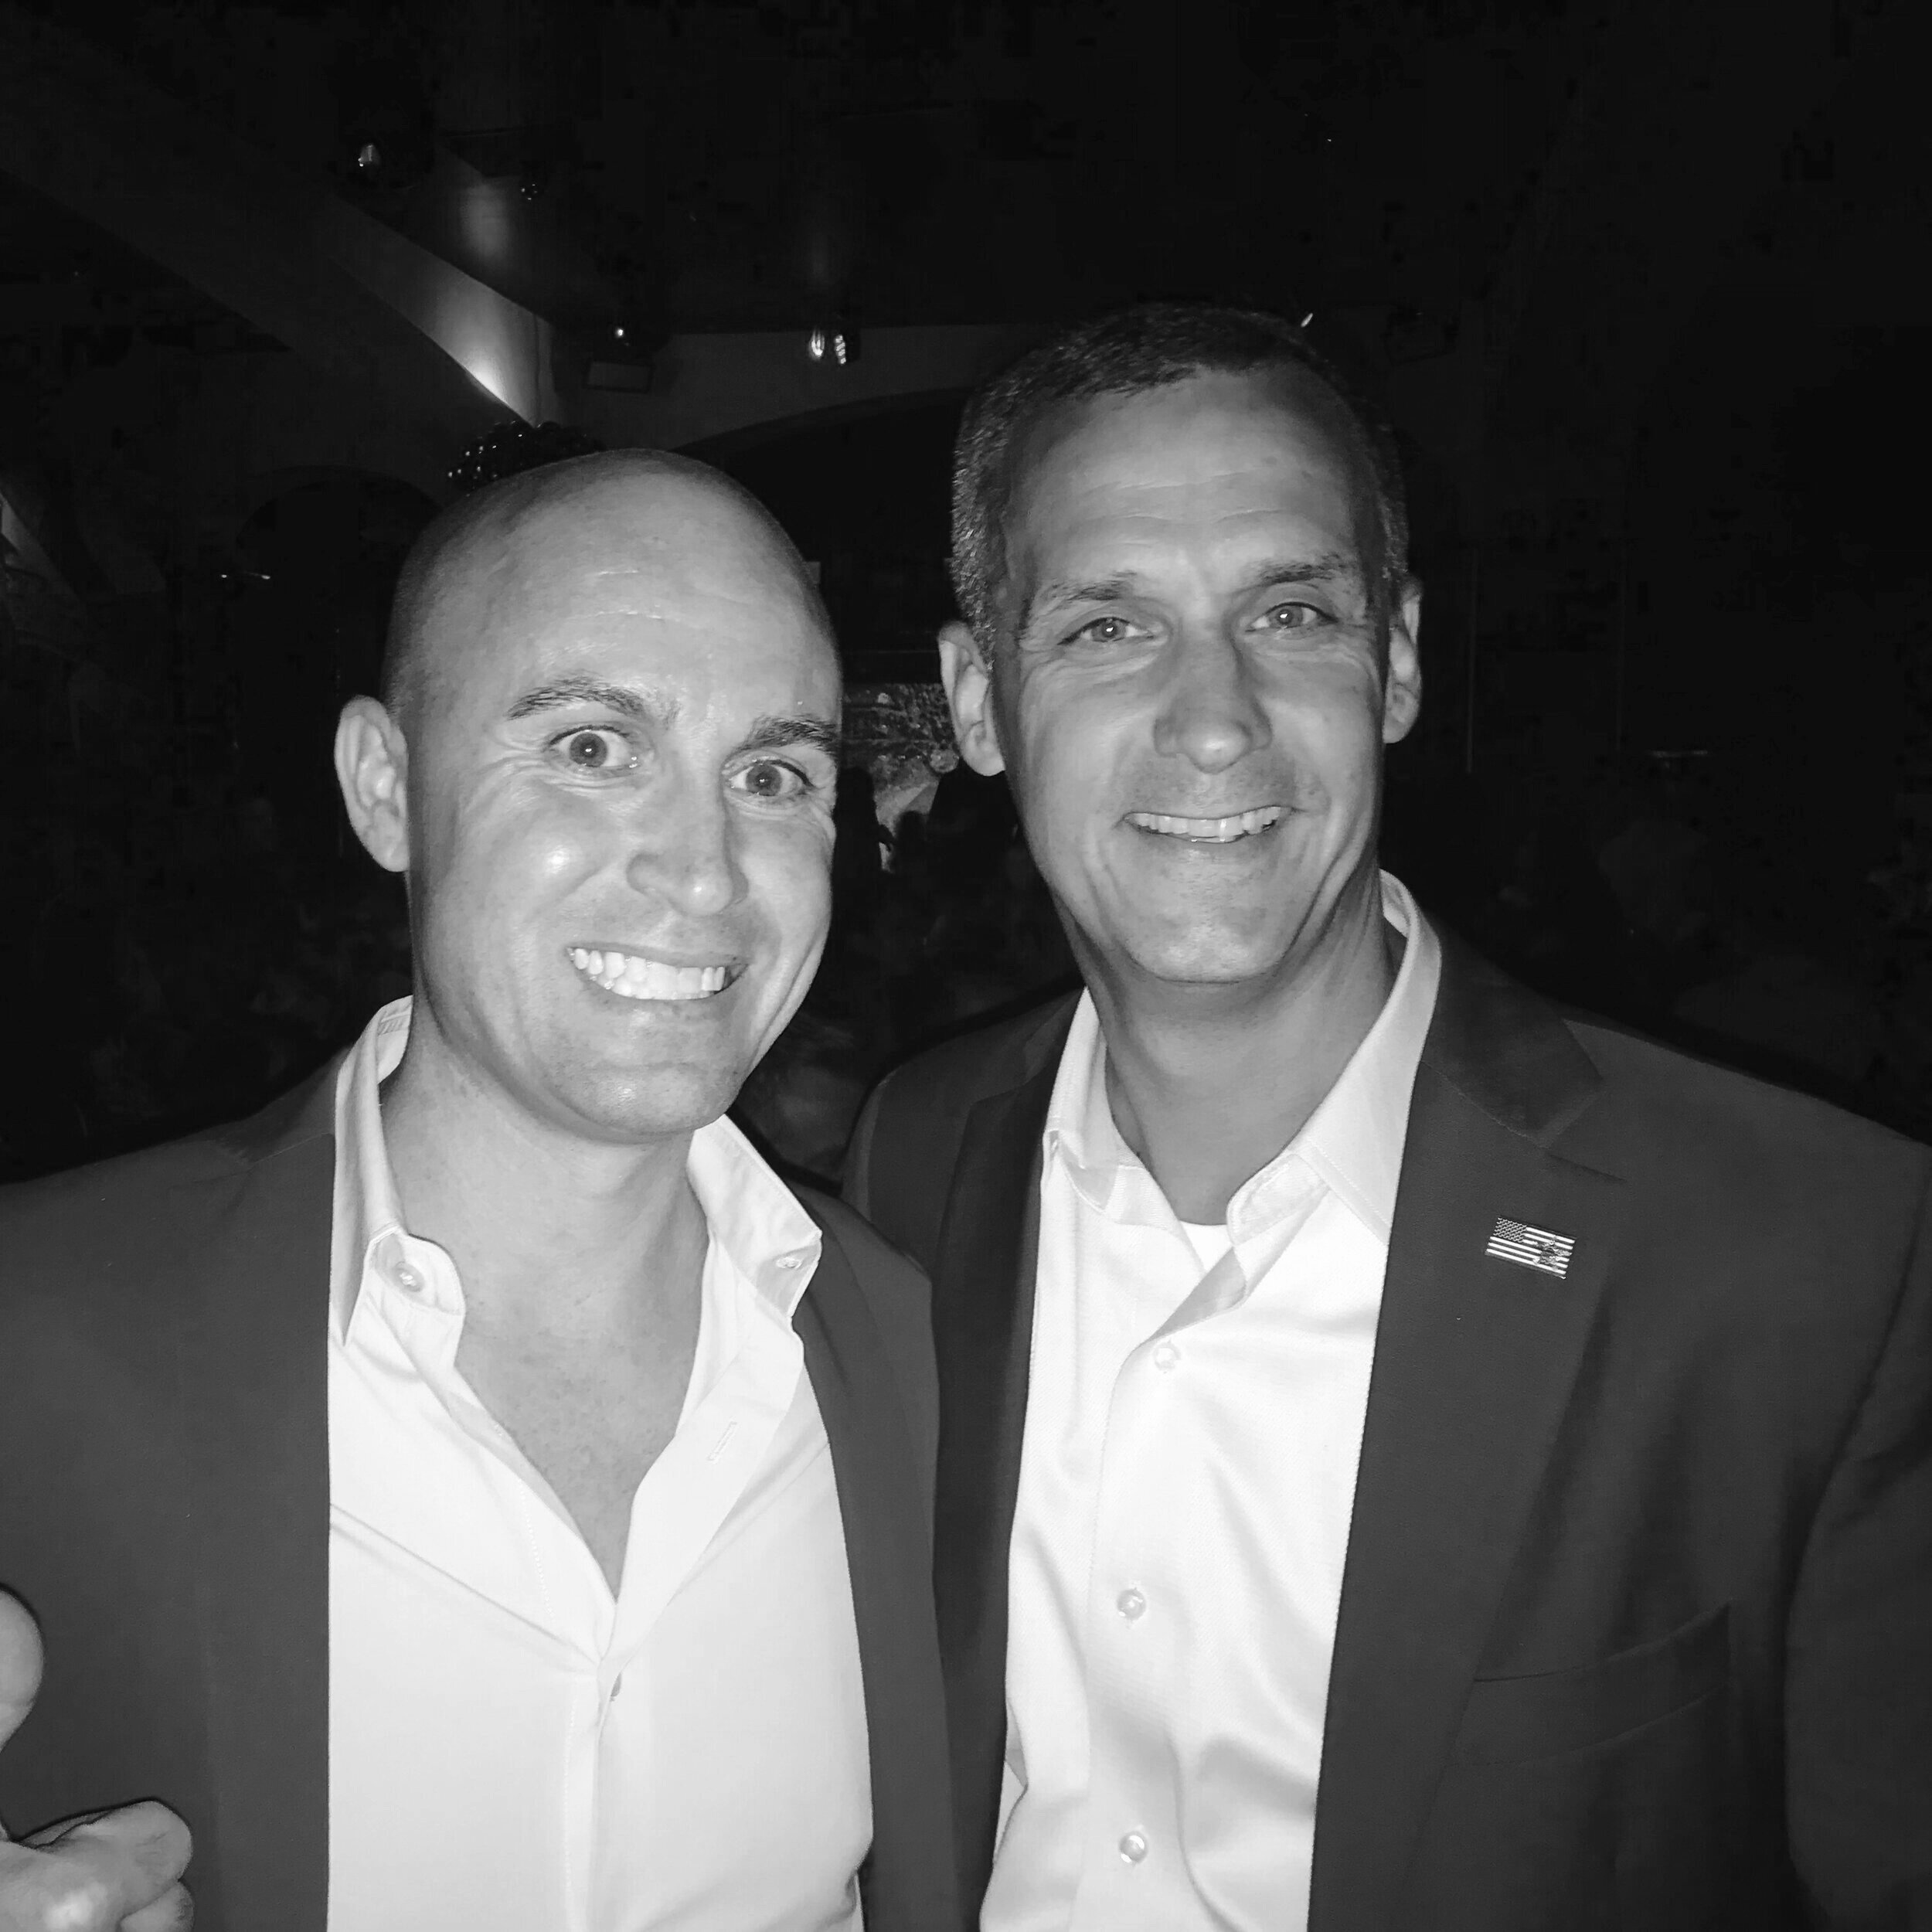 Corey Lewandowski, Fmr. POTUS Campaign Mgr.